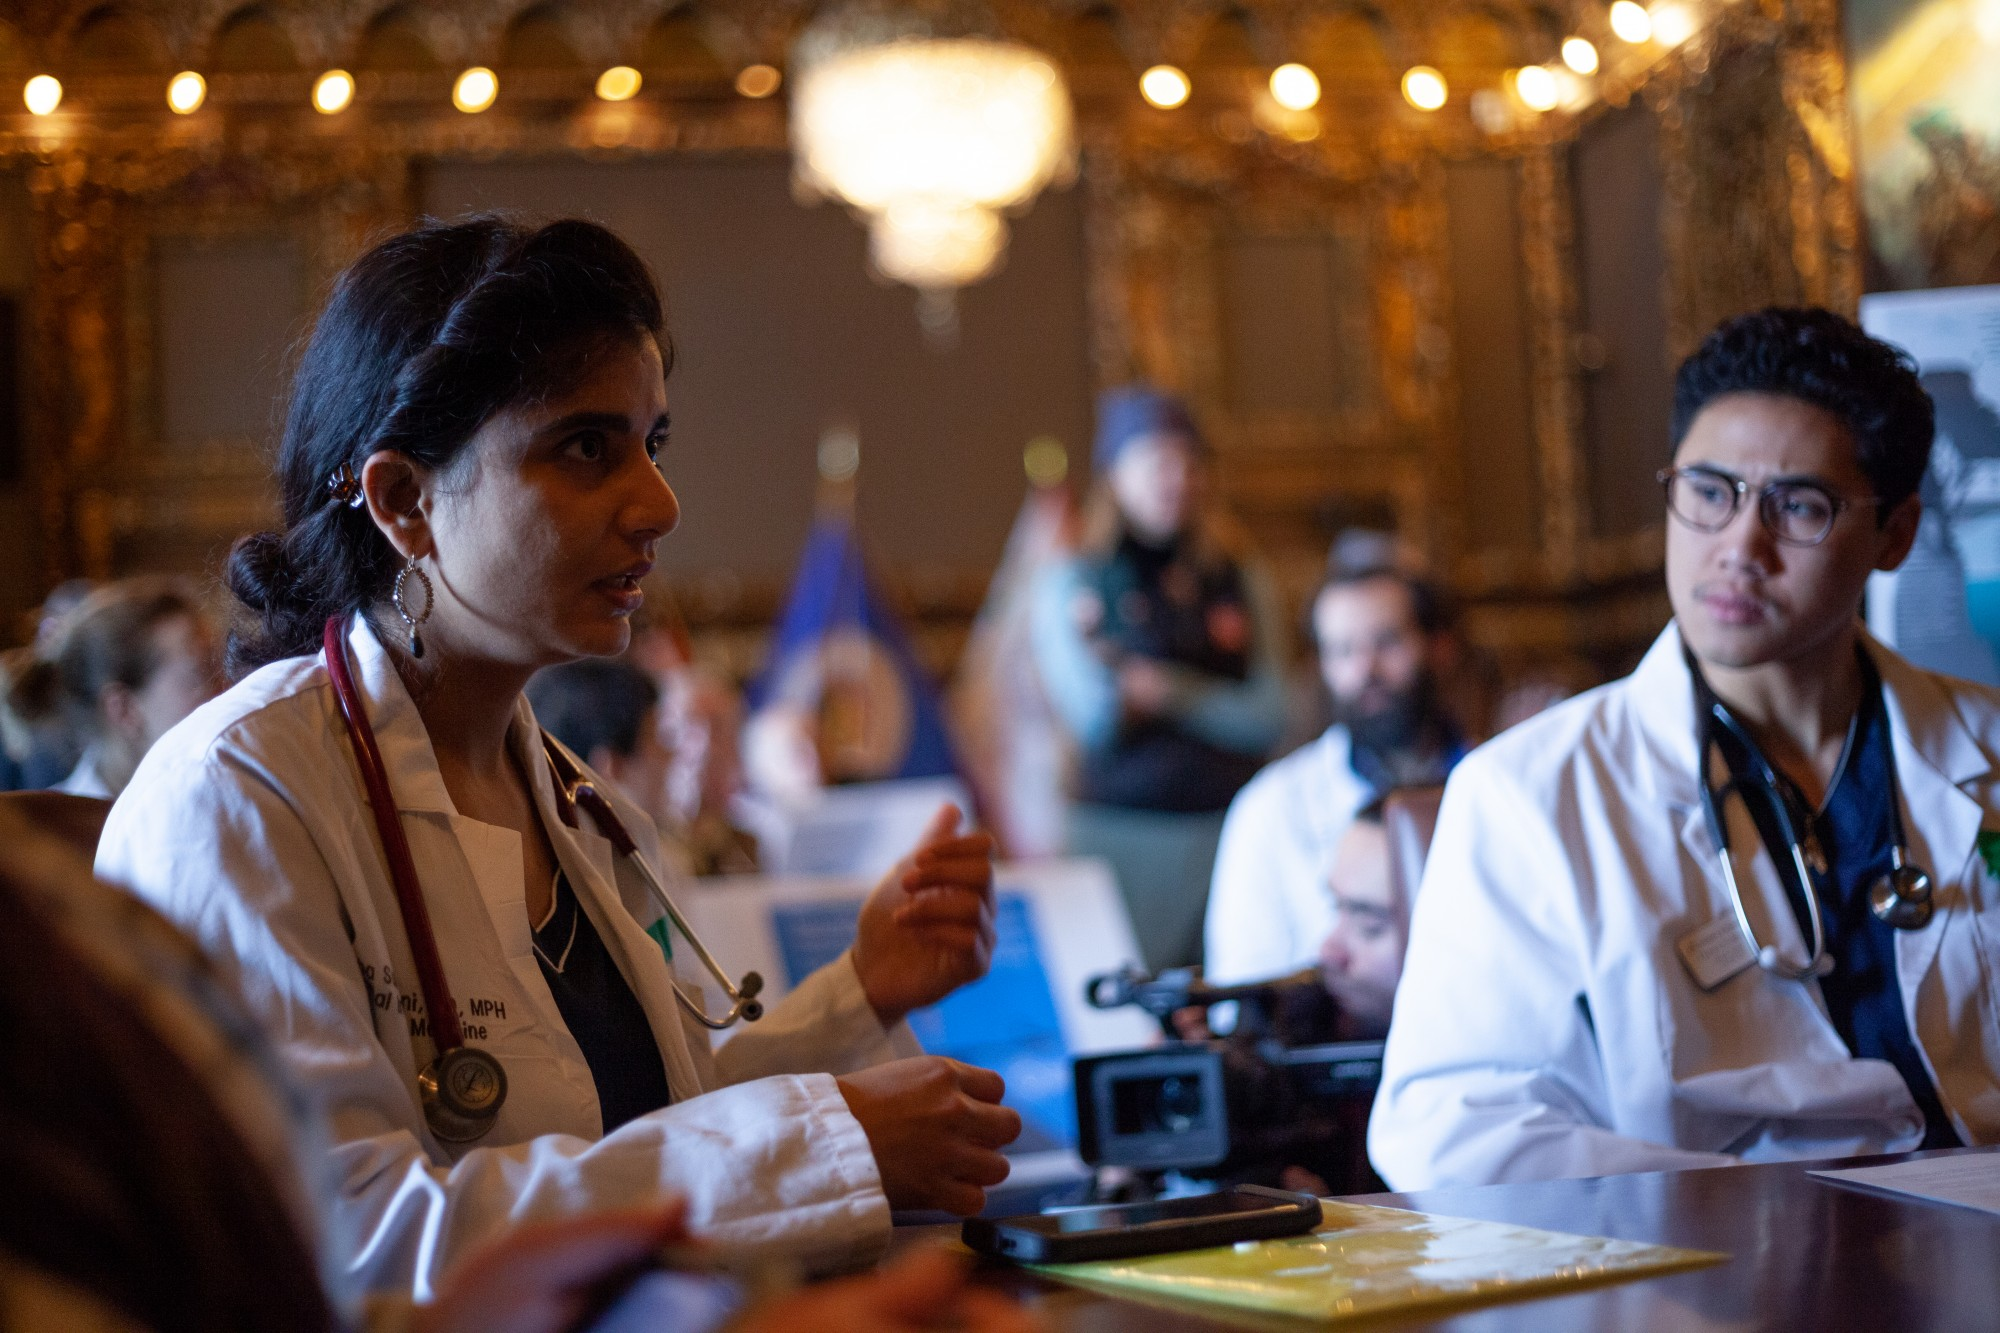 University of Minnesota Assistant Professor of Medicine Vishnu Laalitha Surapaneni, MD speaks at a